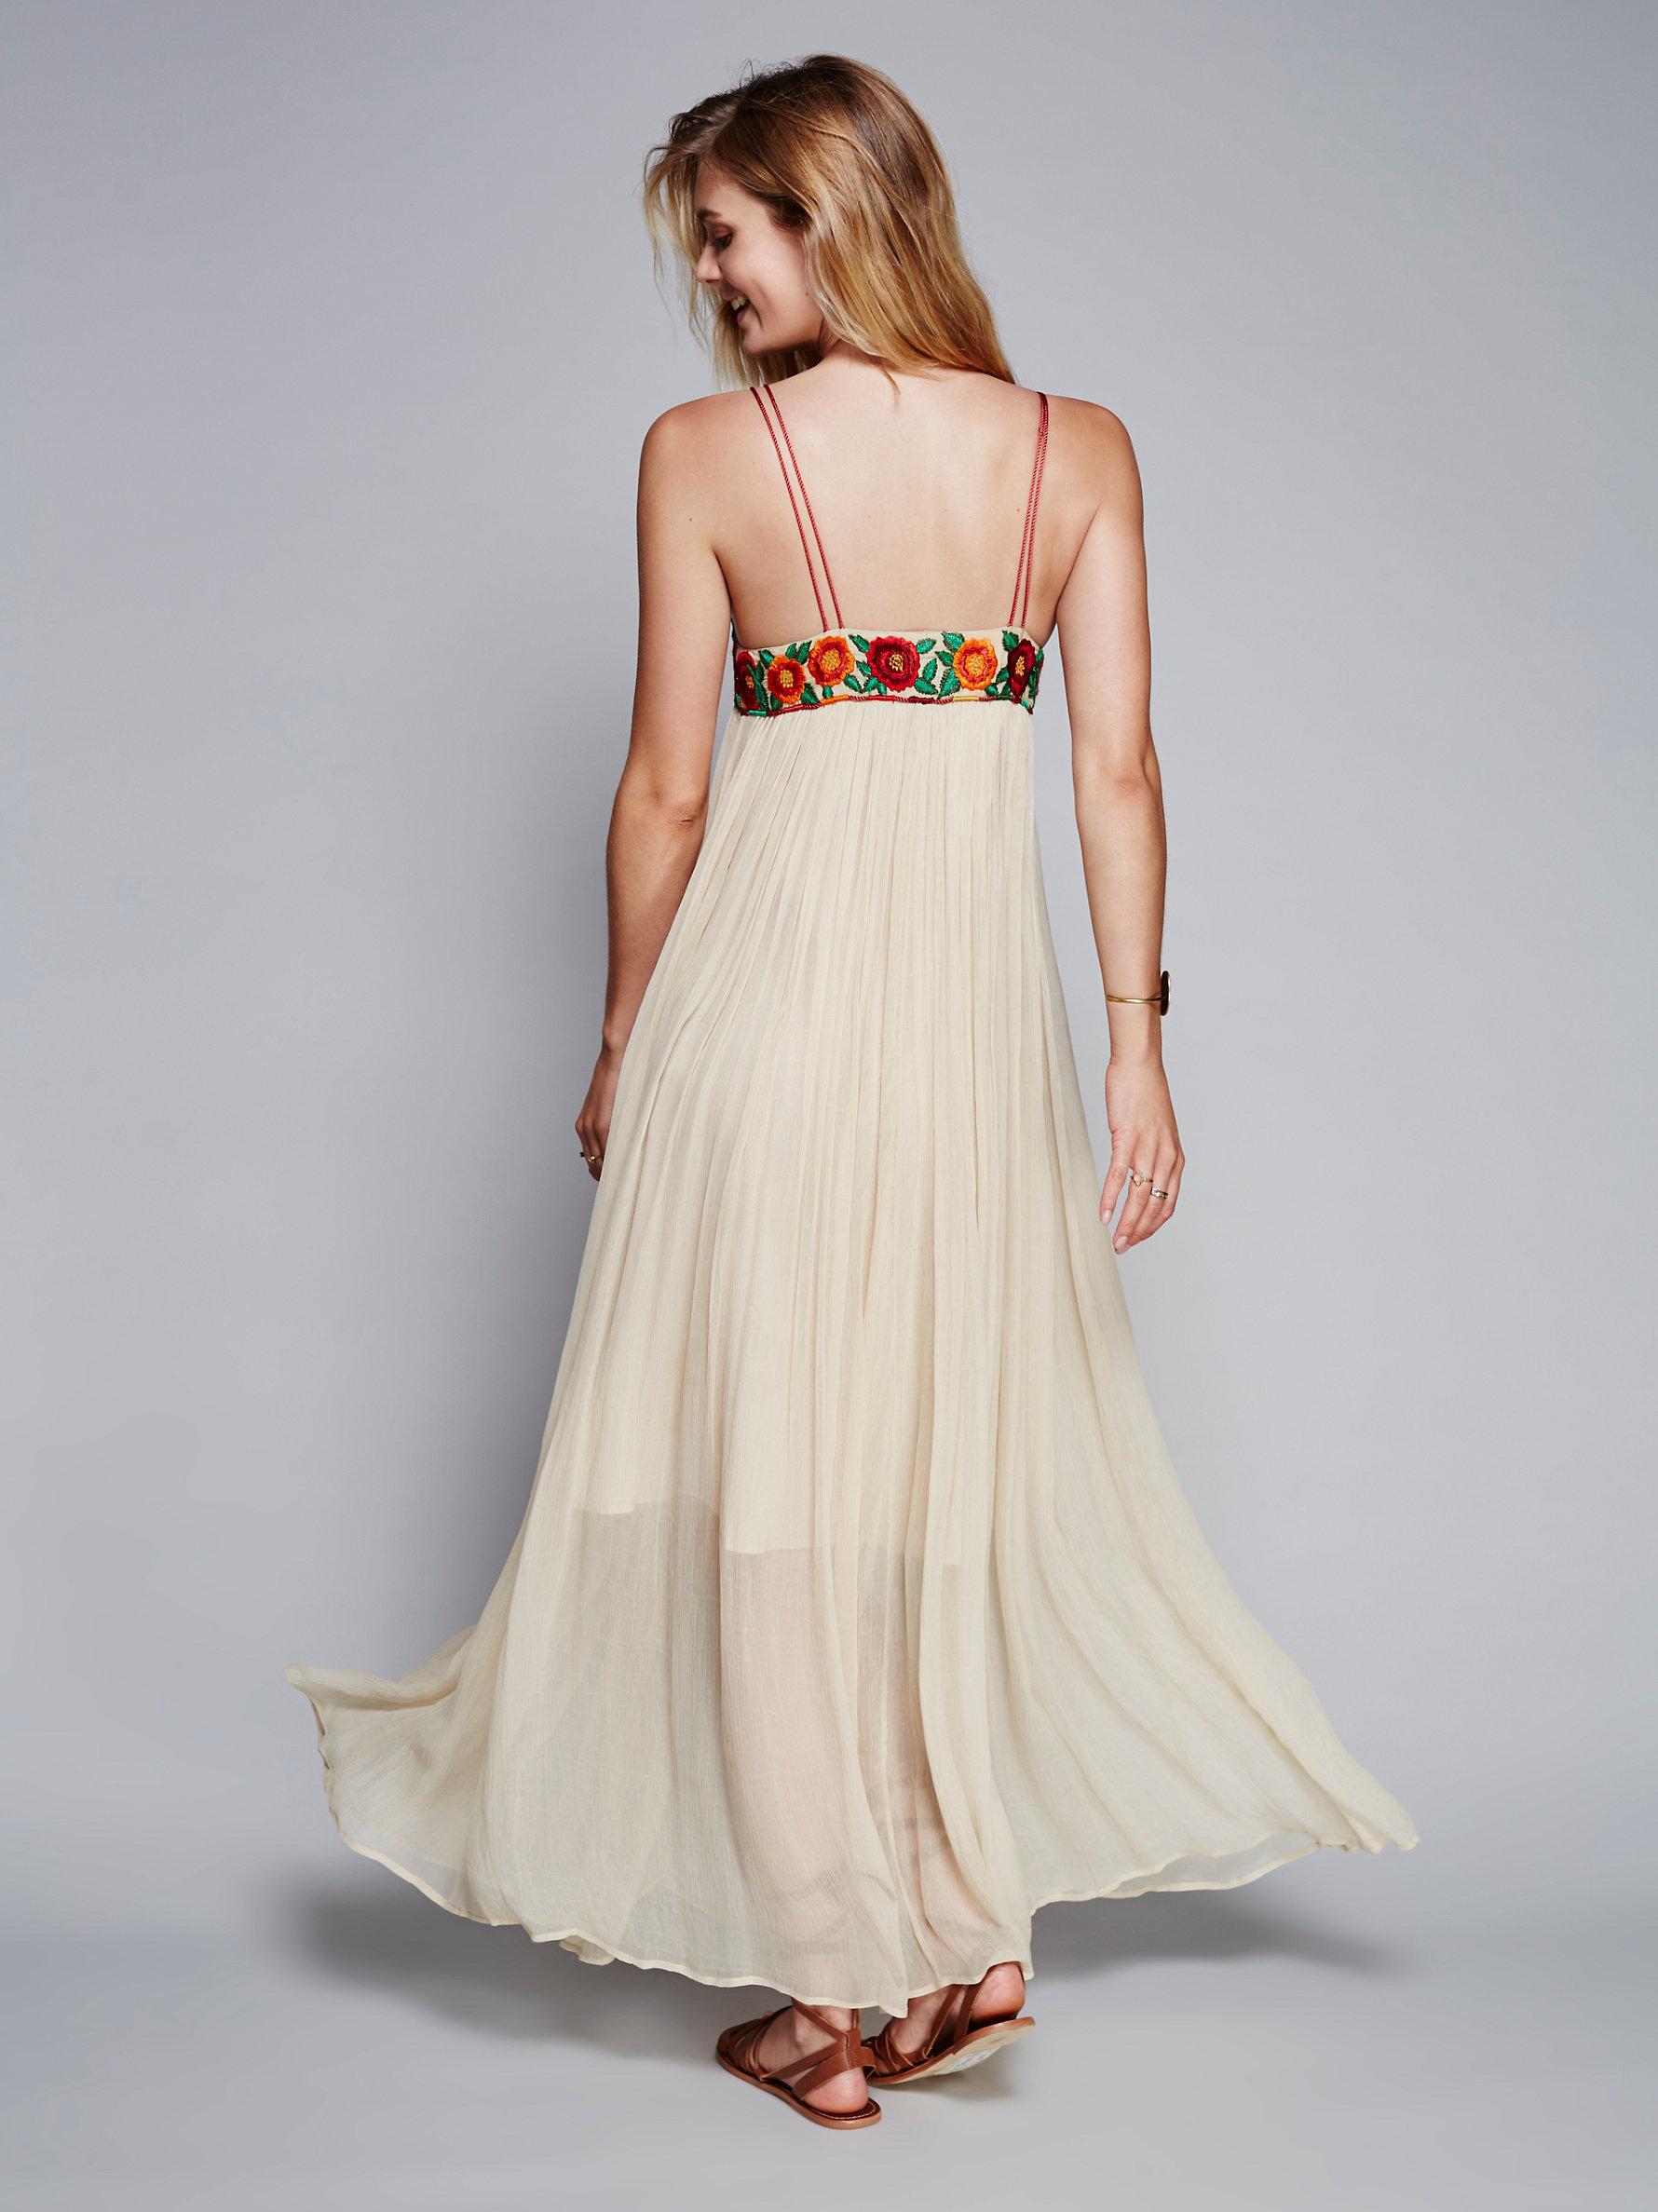 Lyst - Free People Nikita Dress